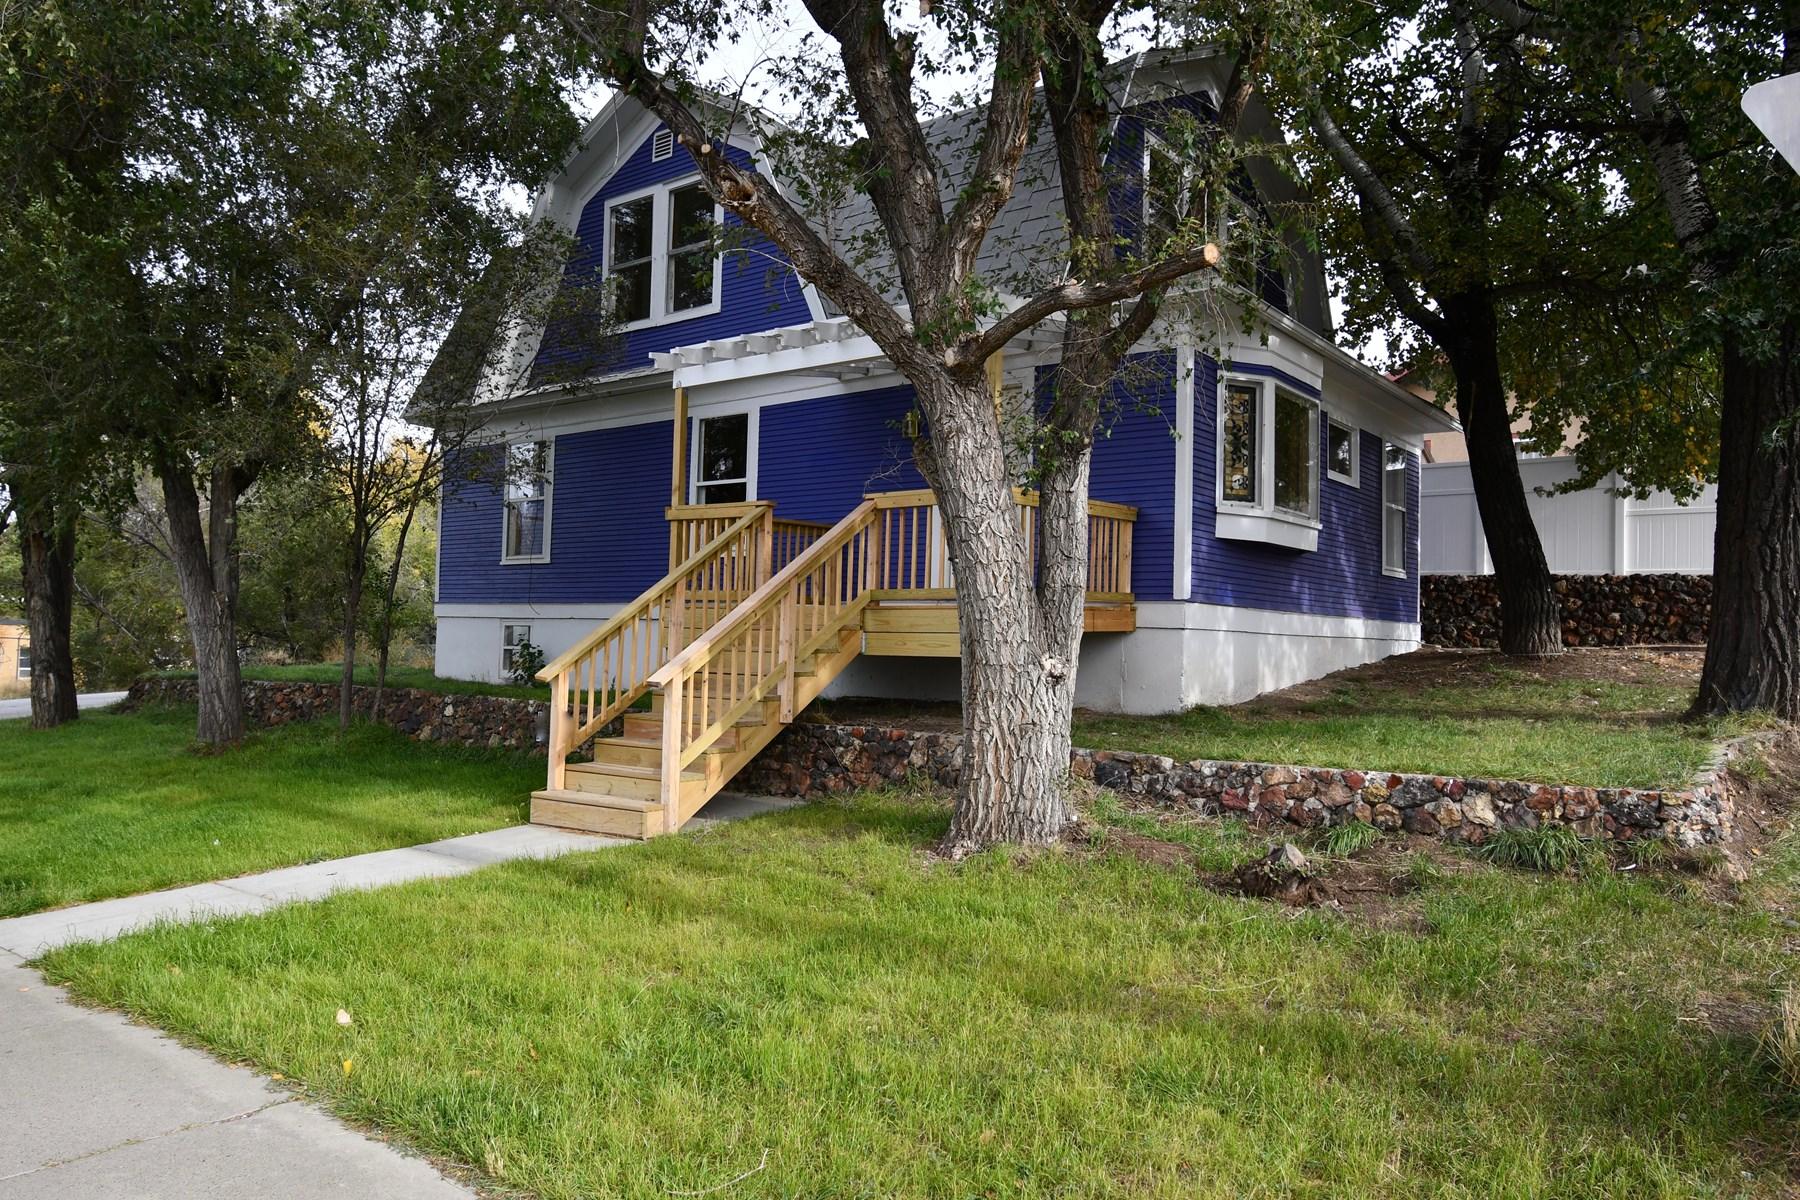 Historic Home For Sale in Glendive, MT